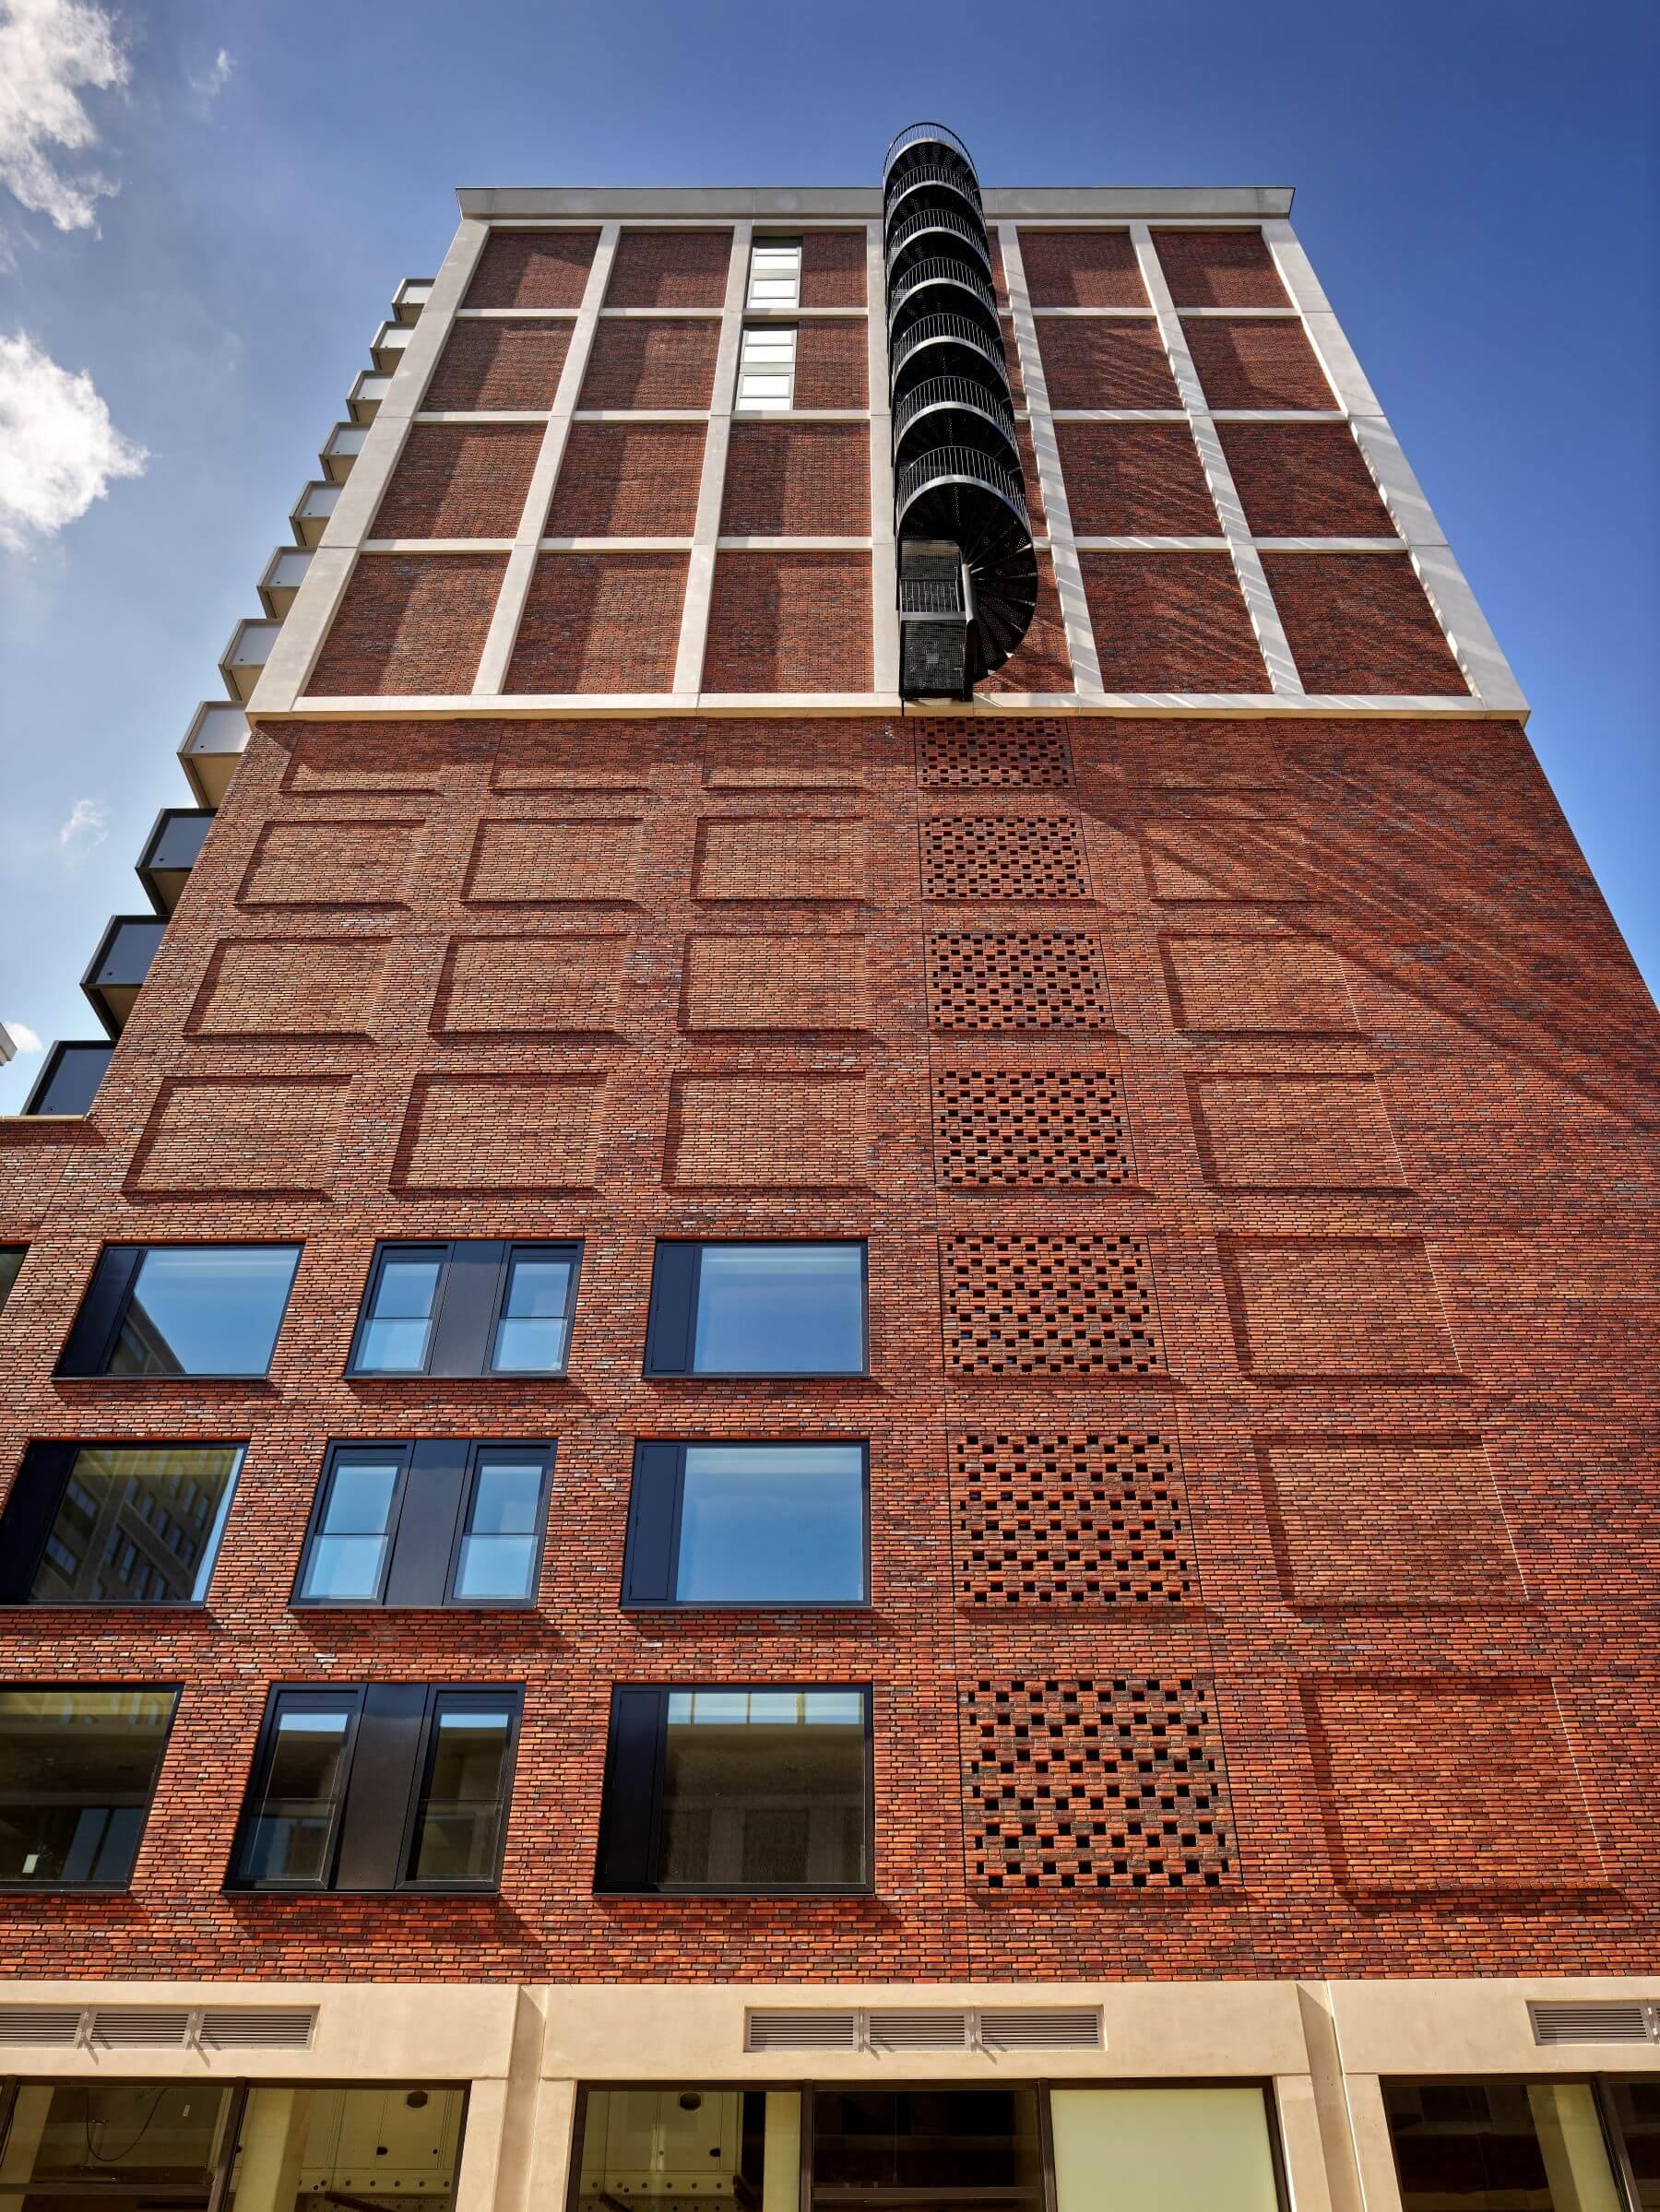 The FIZZ Cobana Rotterdam zijgevel